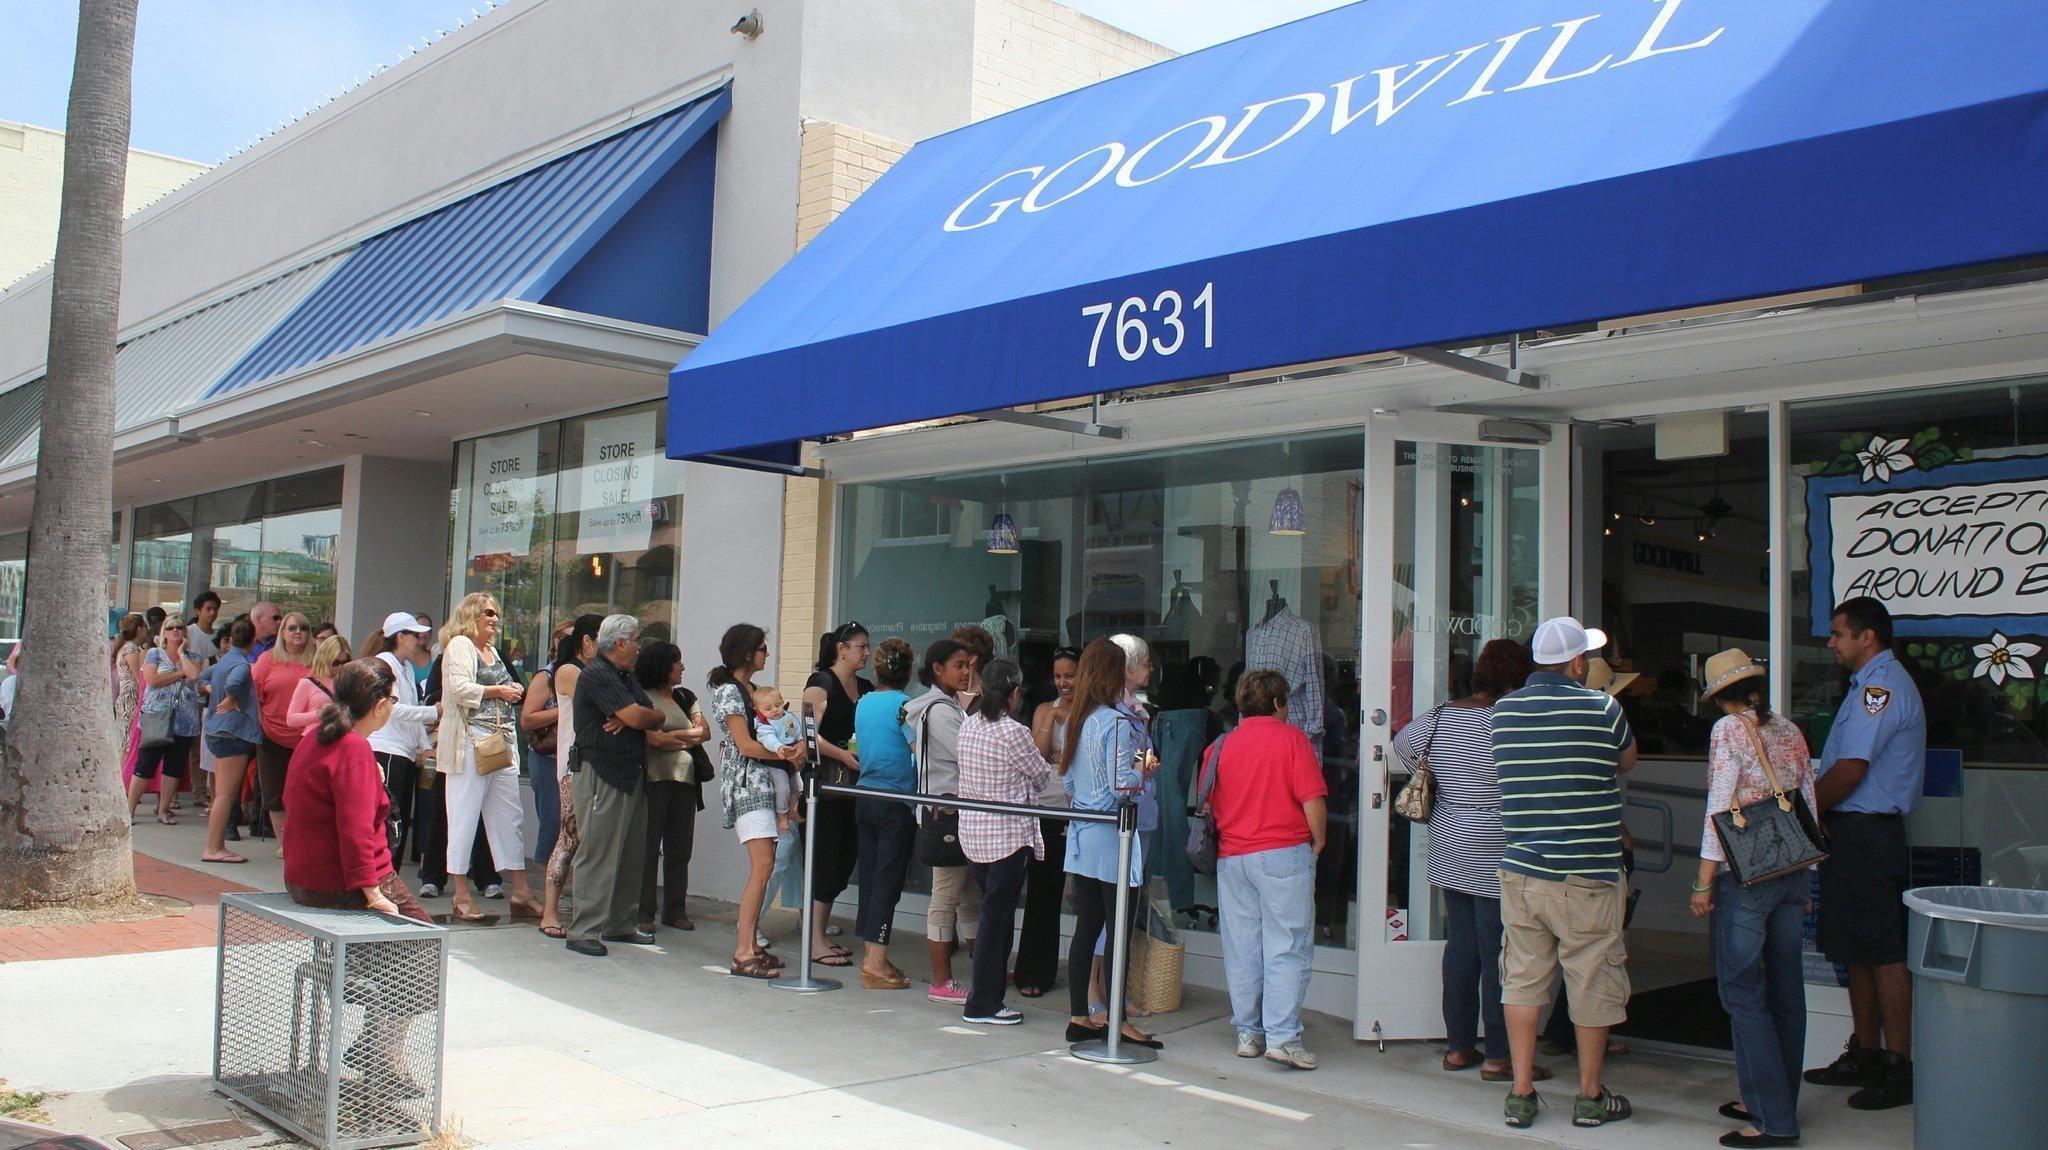 9b64988d8ba Spreading Goodwill  Impressive turnout for opening of La Jolla Goodwill  store - La Jolla Light